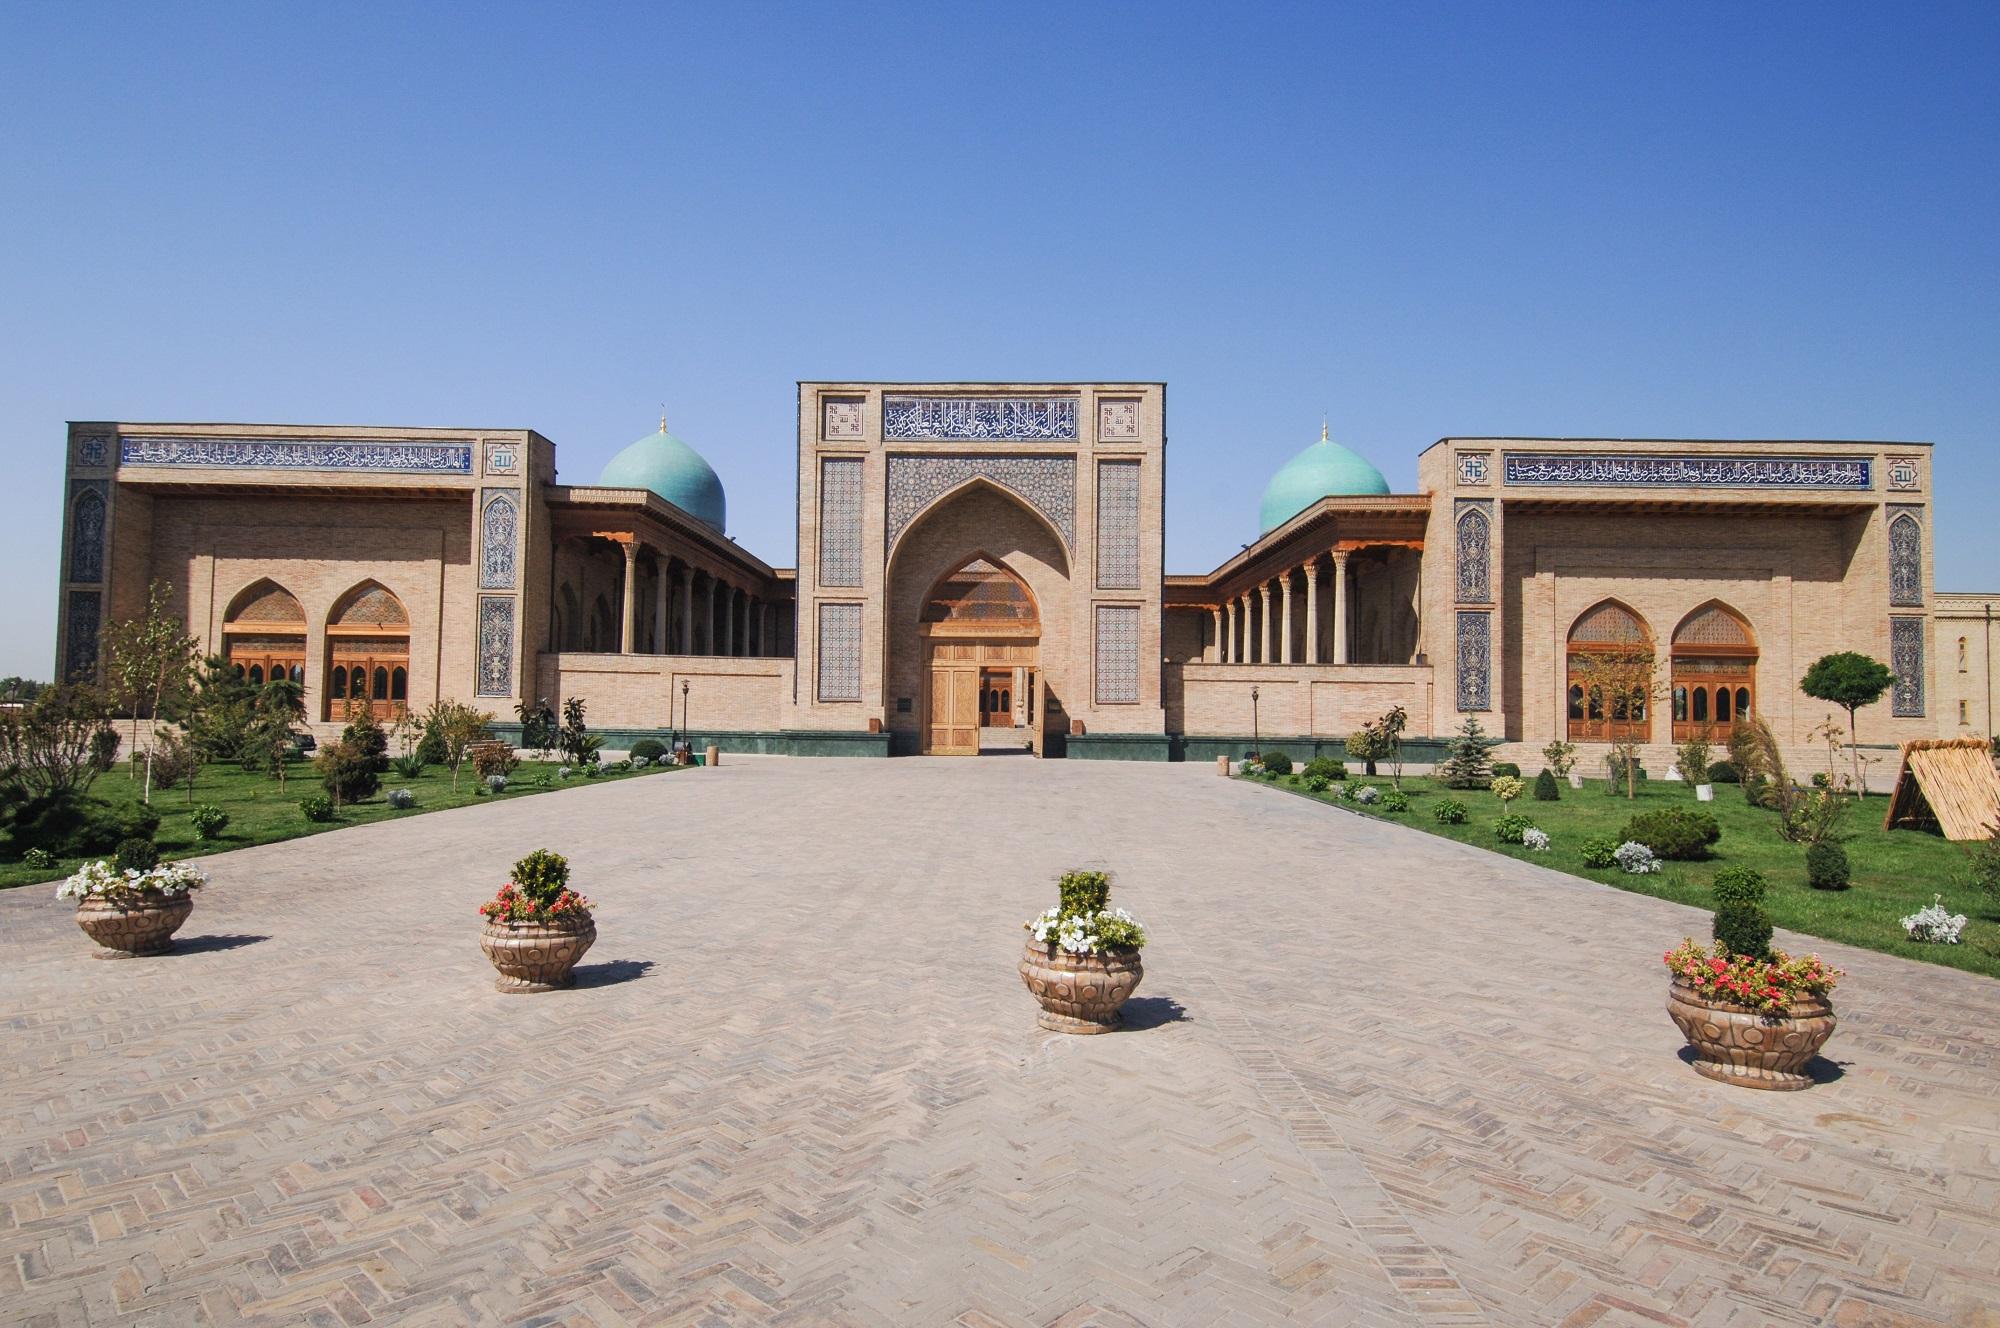 External review of restored architecture of ancient buildings in Tashkent, Uzbekistan